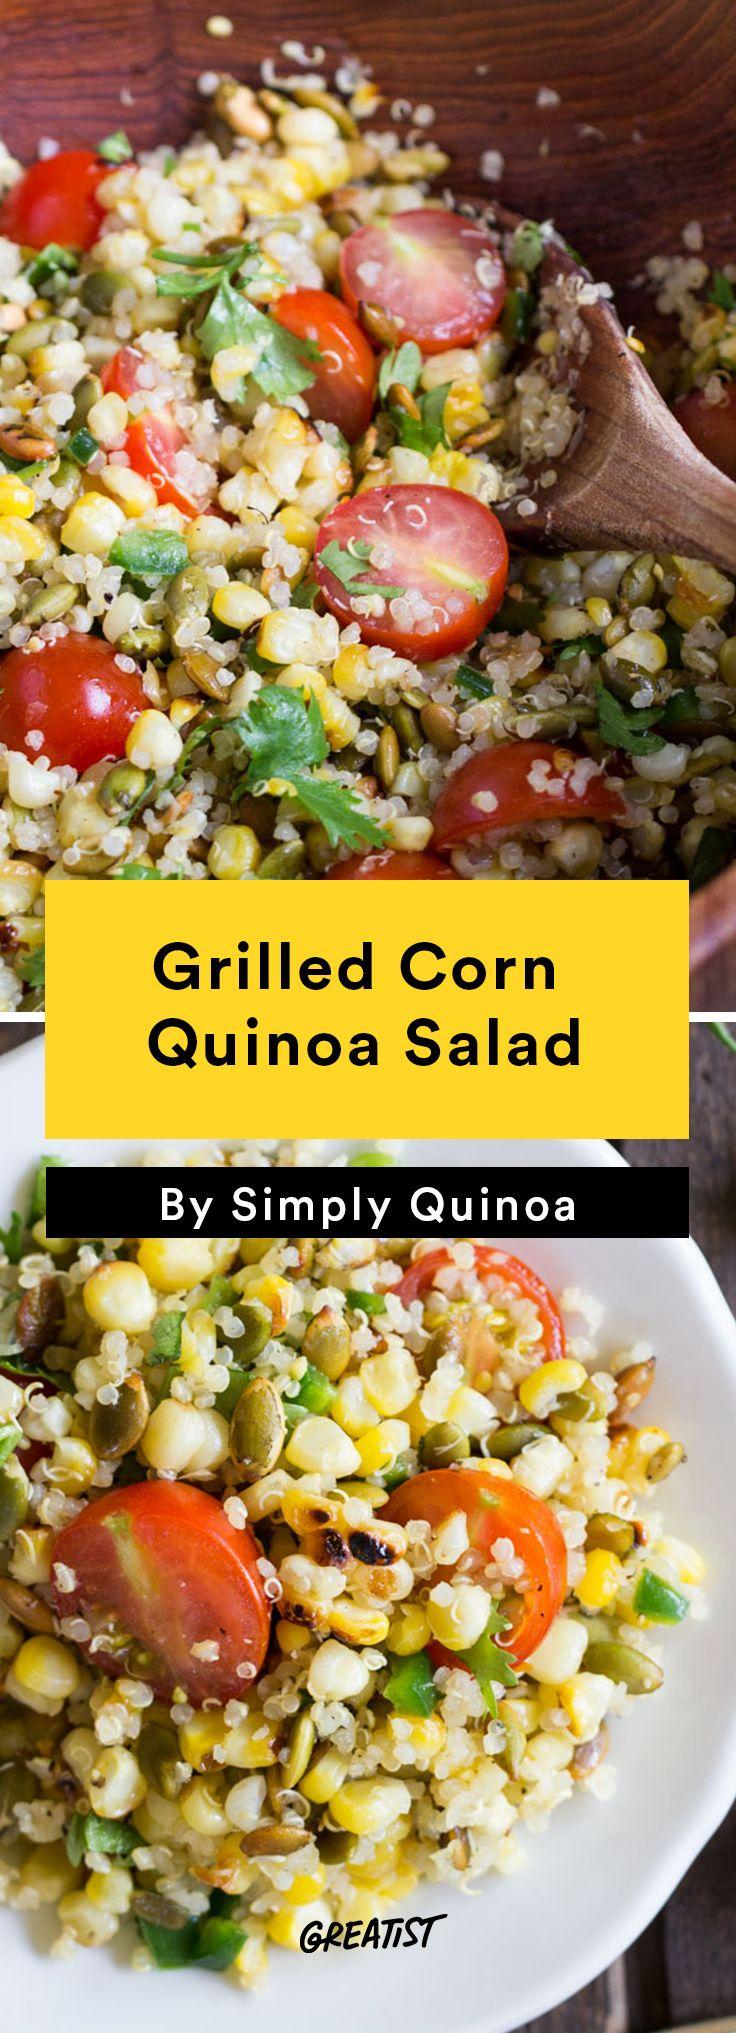 5. Grilled Corn Quinoa Salad #Healthy #Quinoa #Salads http://greatist.com/eat/quinoa-salads-we-cant-wait-to-dig-into